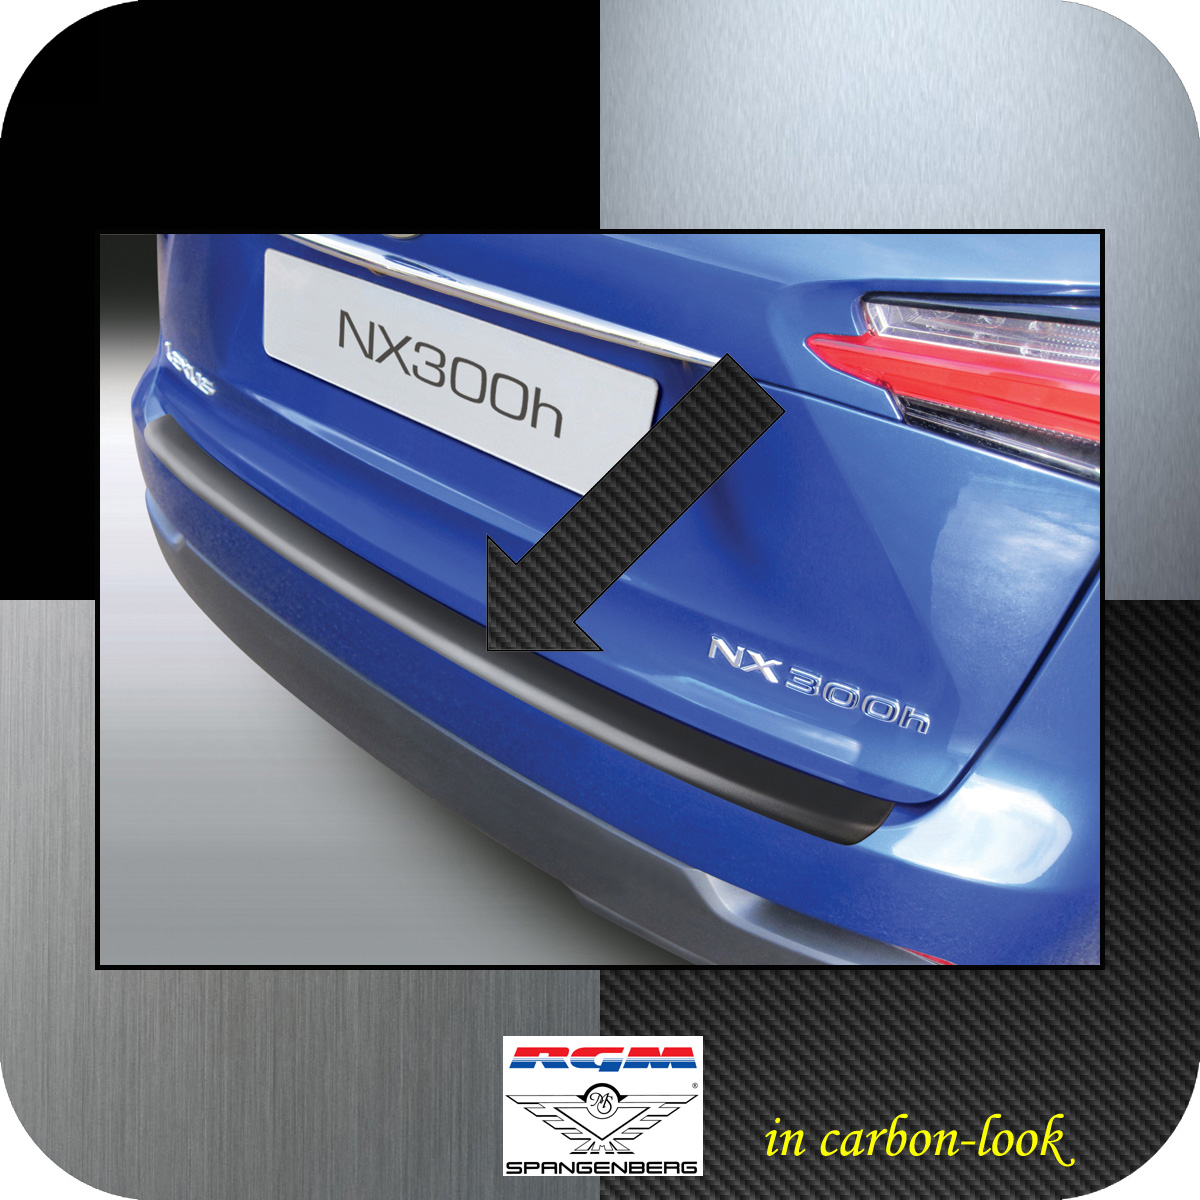 Ladekantenschutz Carbon-Look Lexus NX SUV Kombi ab Baujahr 2014- 3509787